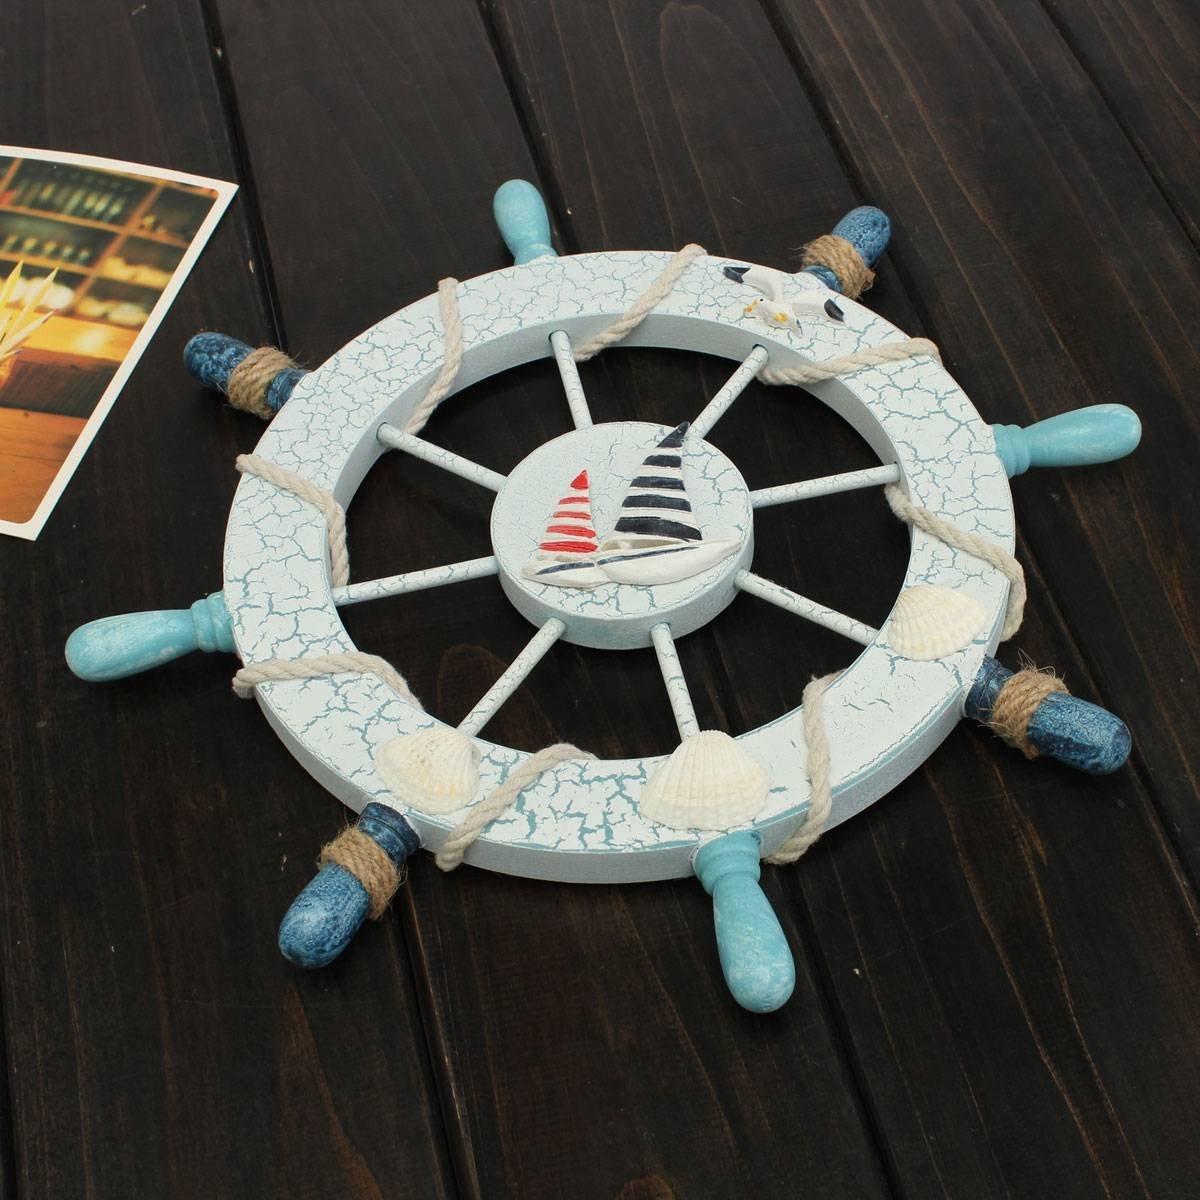 Nautical Beach Wooden Boat Ship Steering Wheel Fishing Net Shell Home Wall Decor Sailing Description This